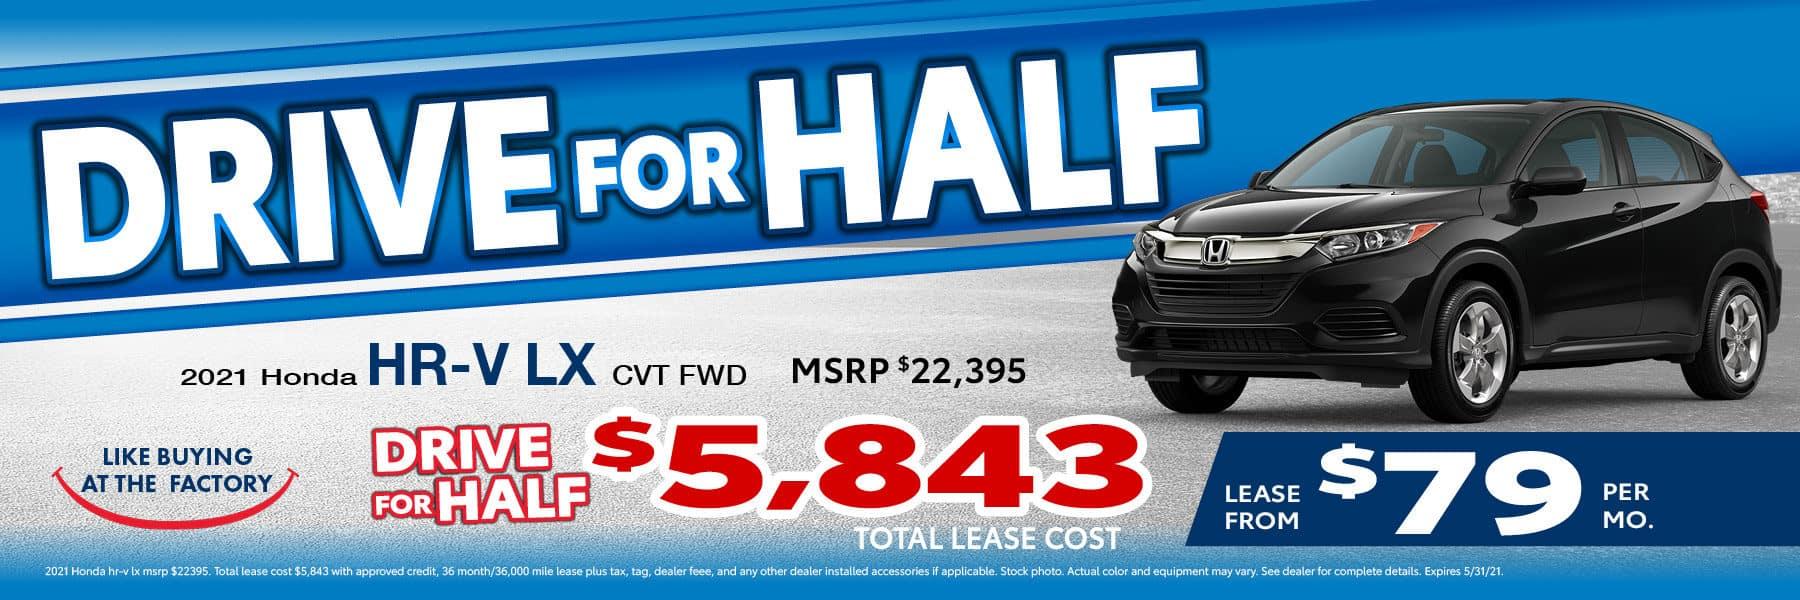 v2T3991 HQ Honda 1800×600 Drive Half3